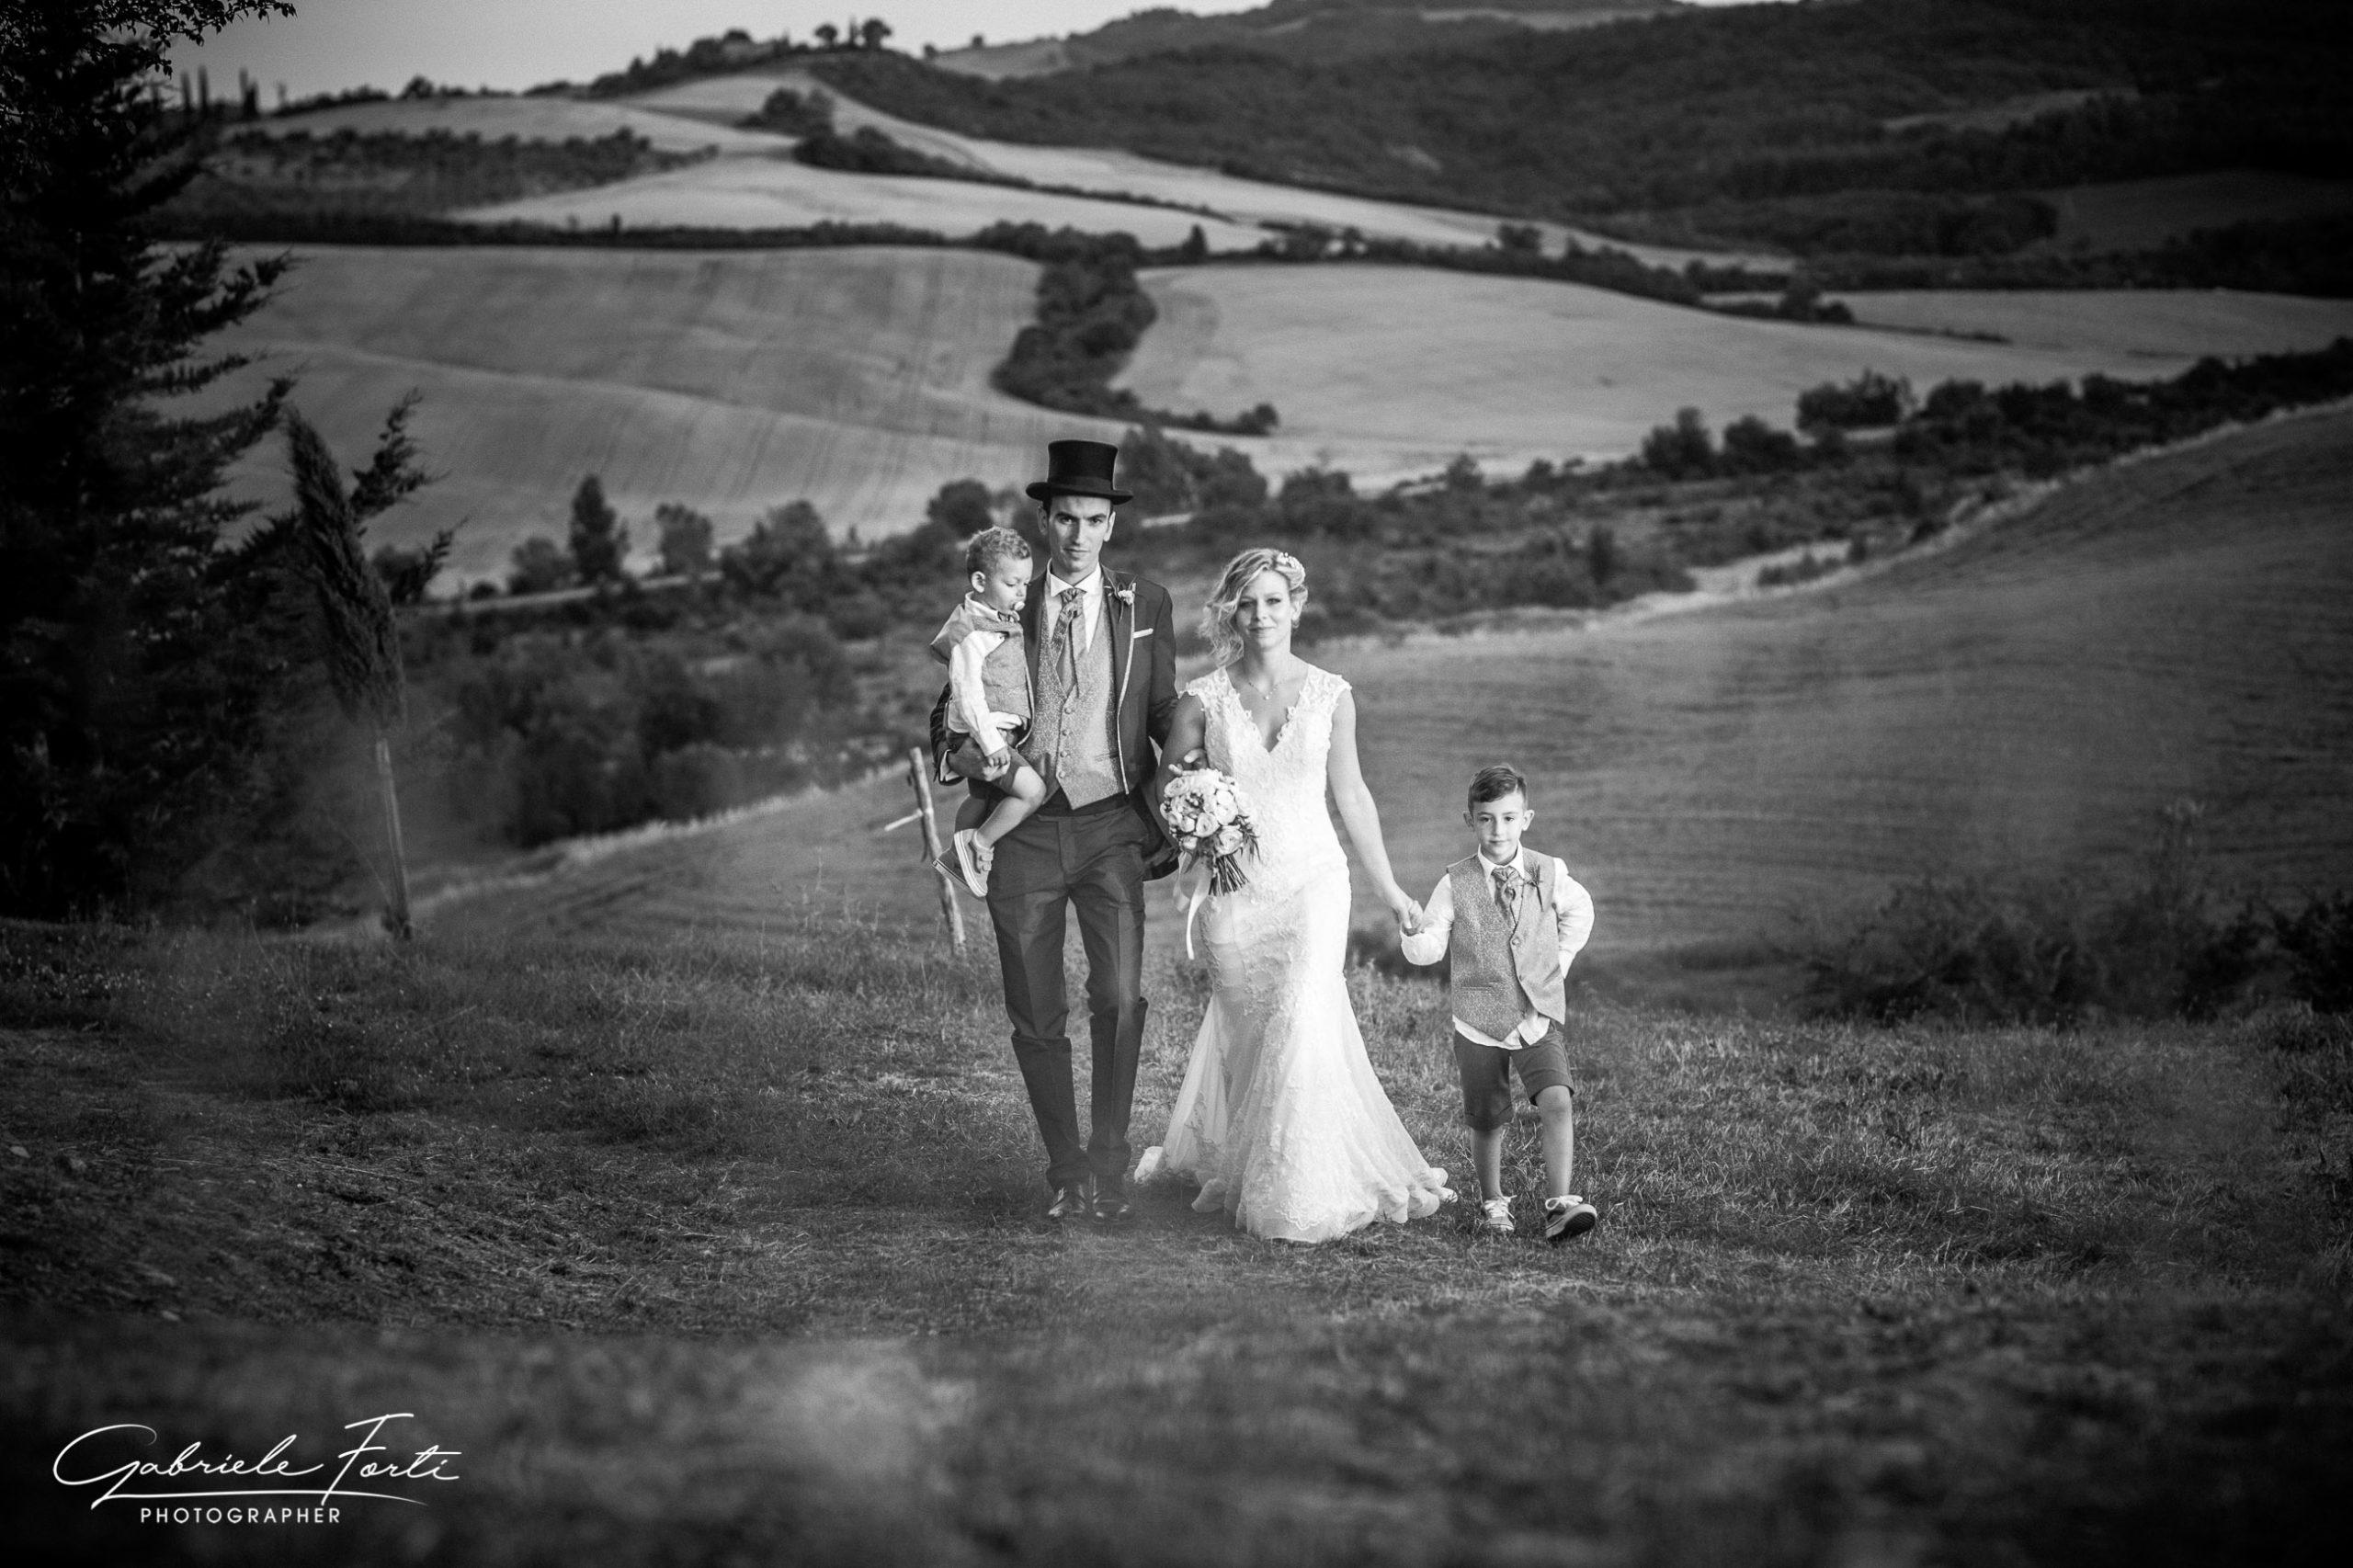 wedding-siena-val-d'orcoa-la-rimbecca-photographer-foto-forti-gabriele-1